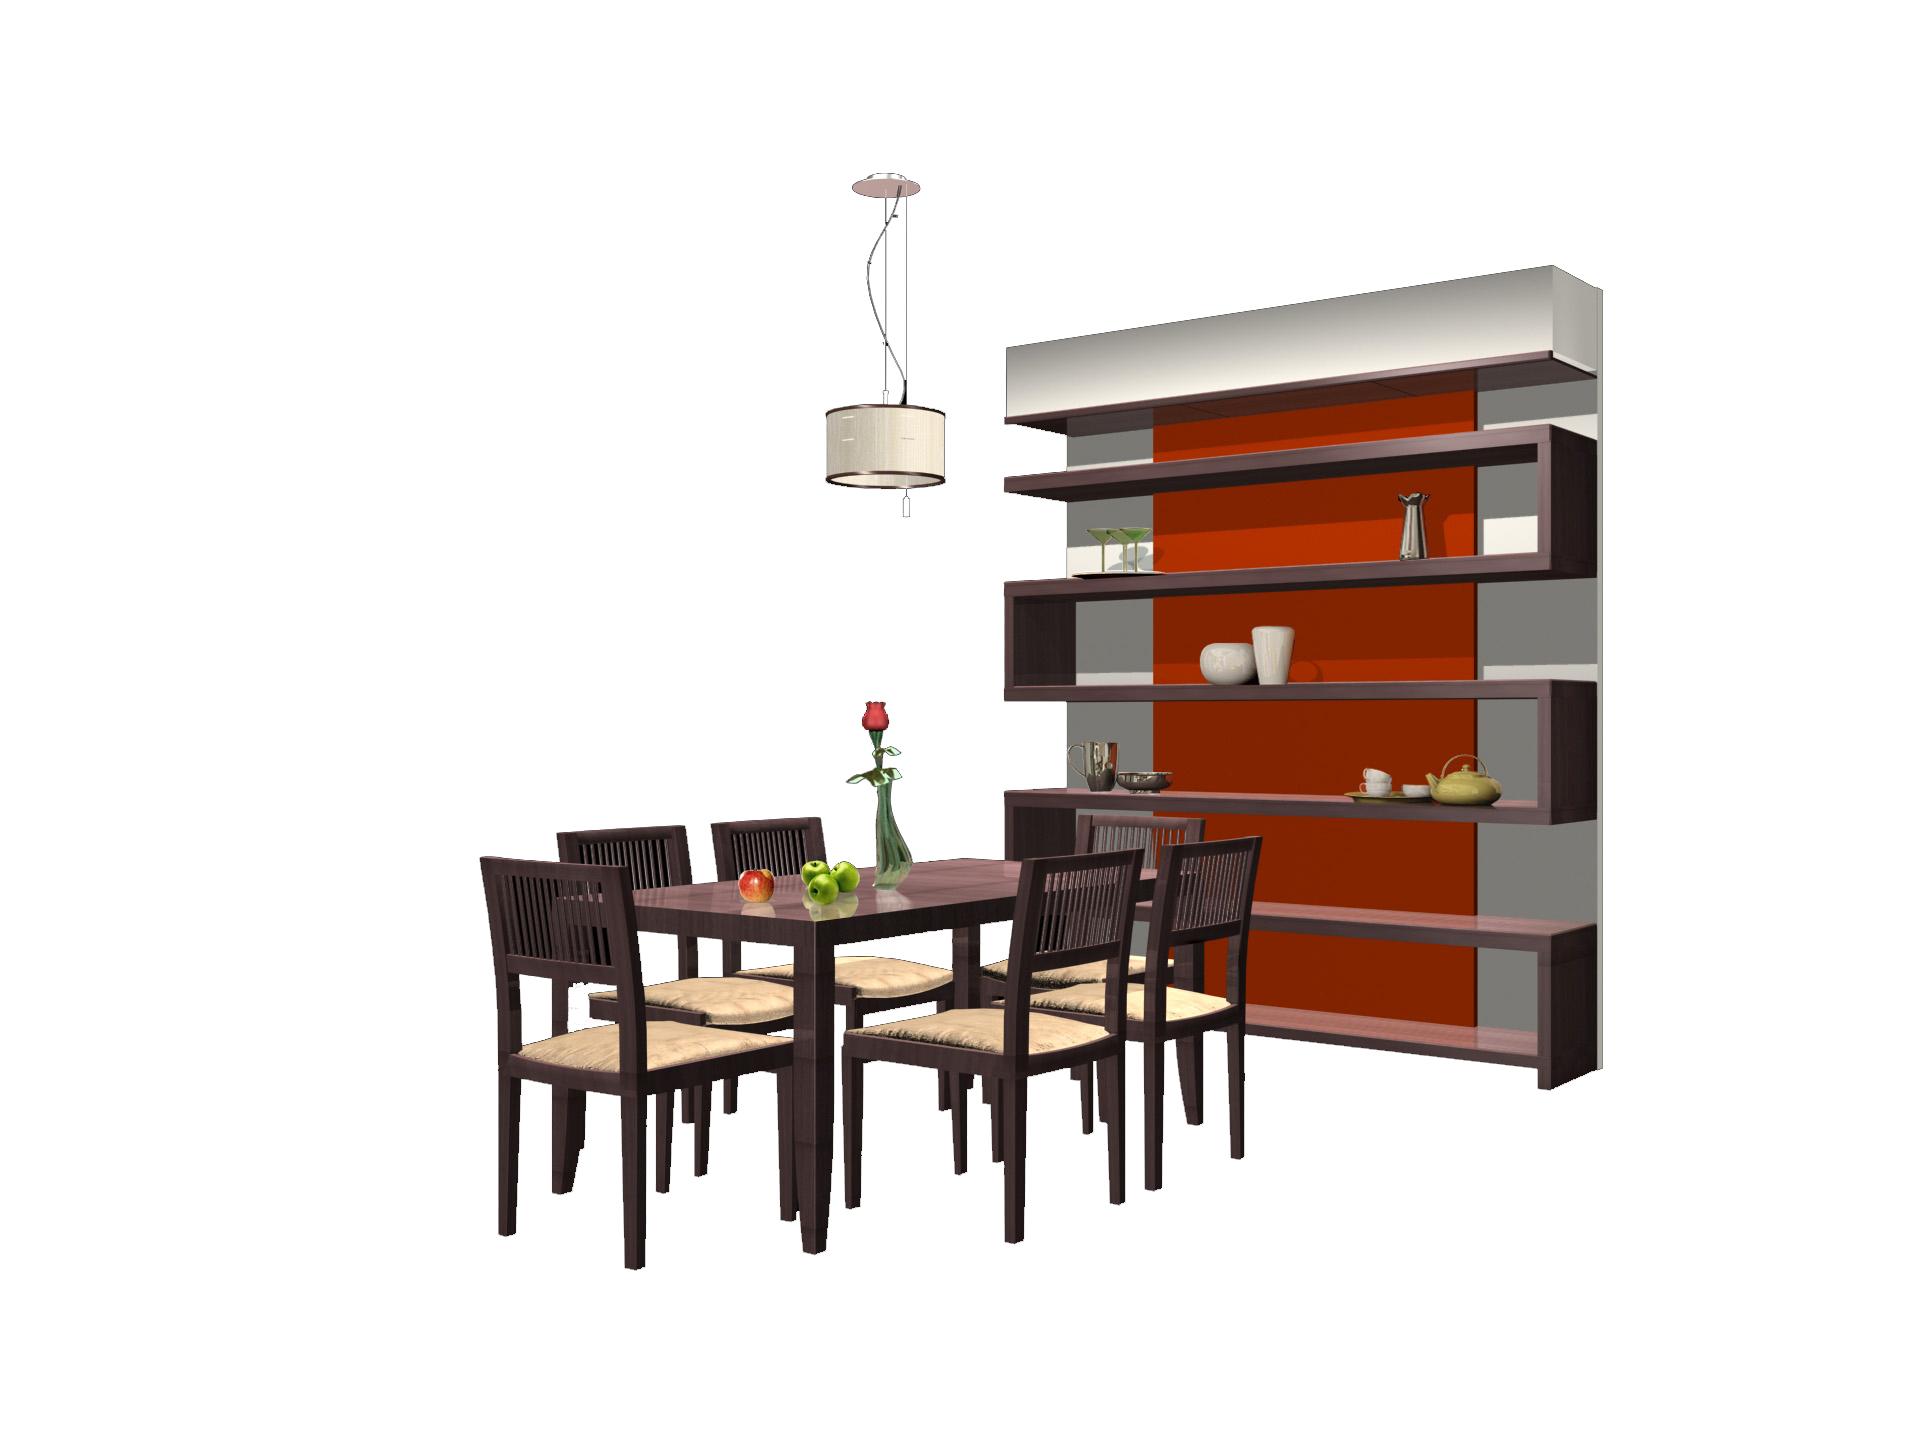 2d Autocad Home Designs also Block likewise Follow Cadblocksfree also Entourage Free Autocad Furniture in addition AutoCAD Sink Detail. on free revit furniture blocks